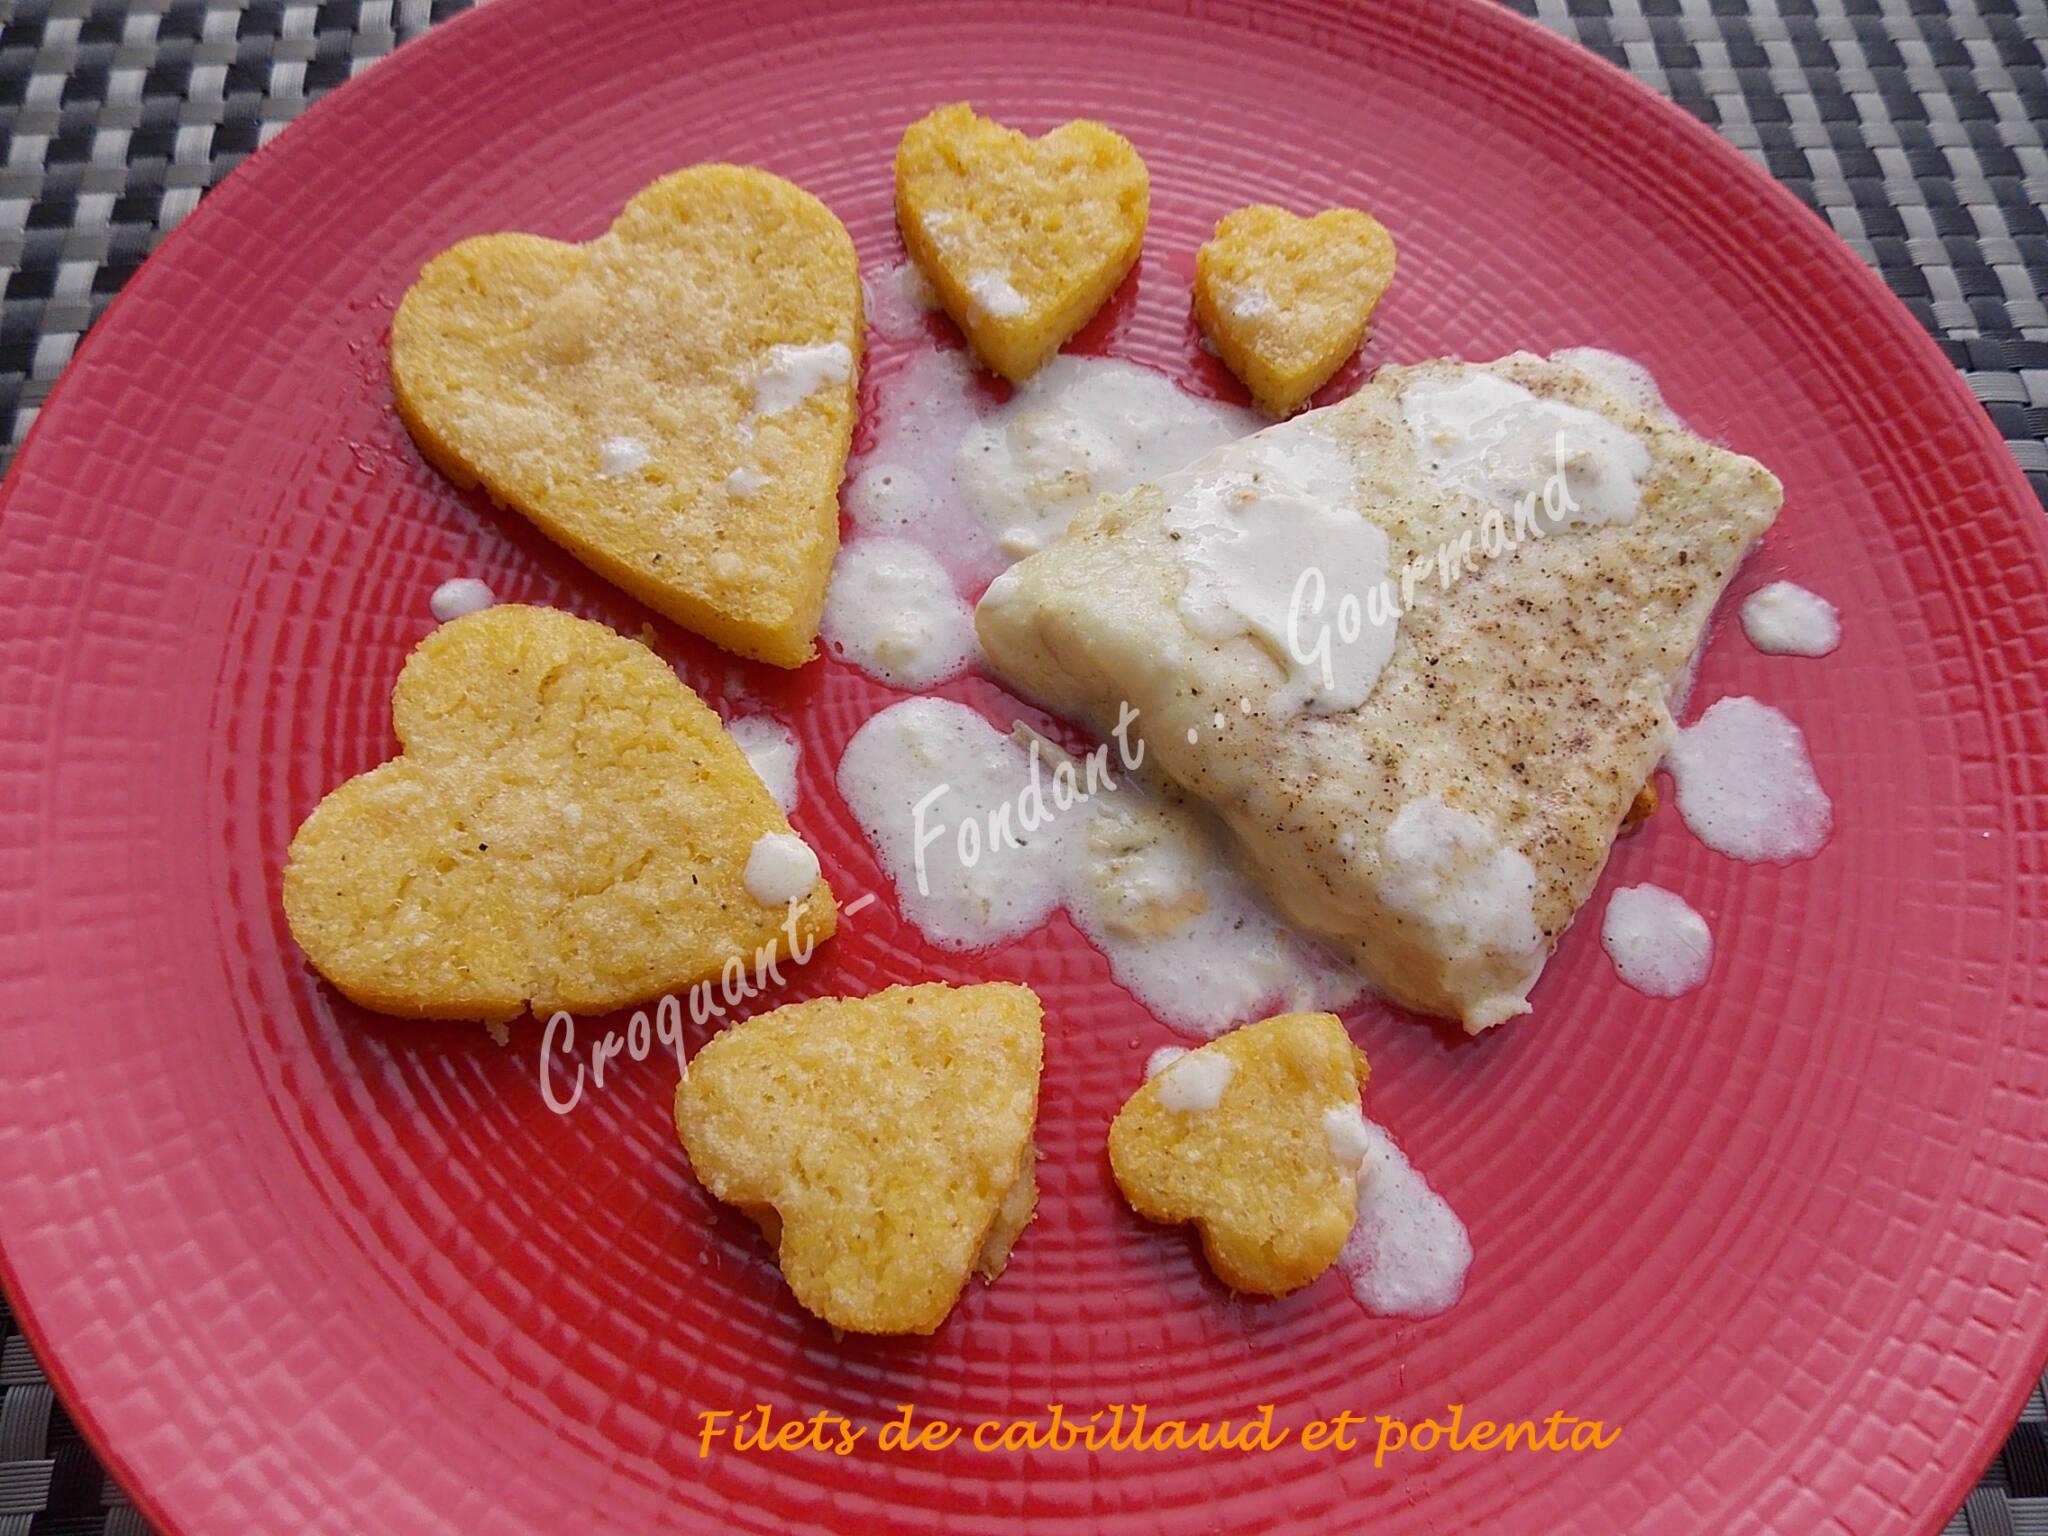 filets de cabillaud et polenta croquant fondant gourmand